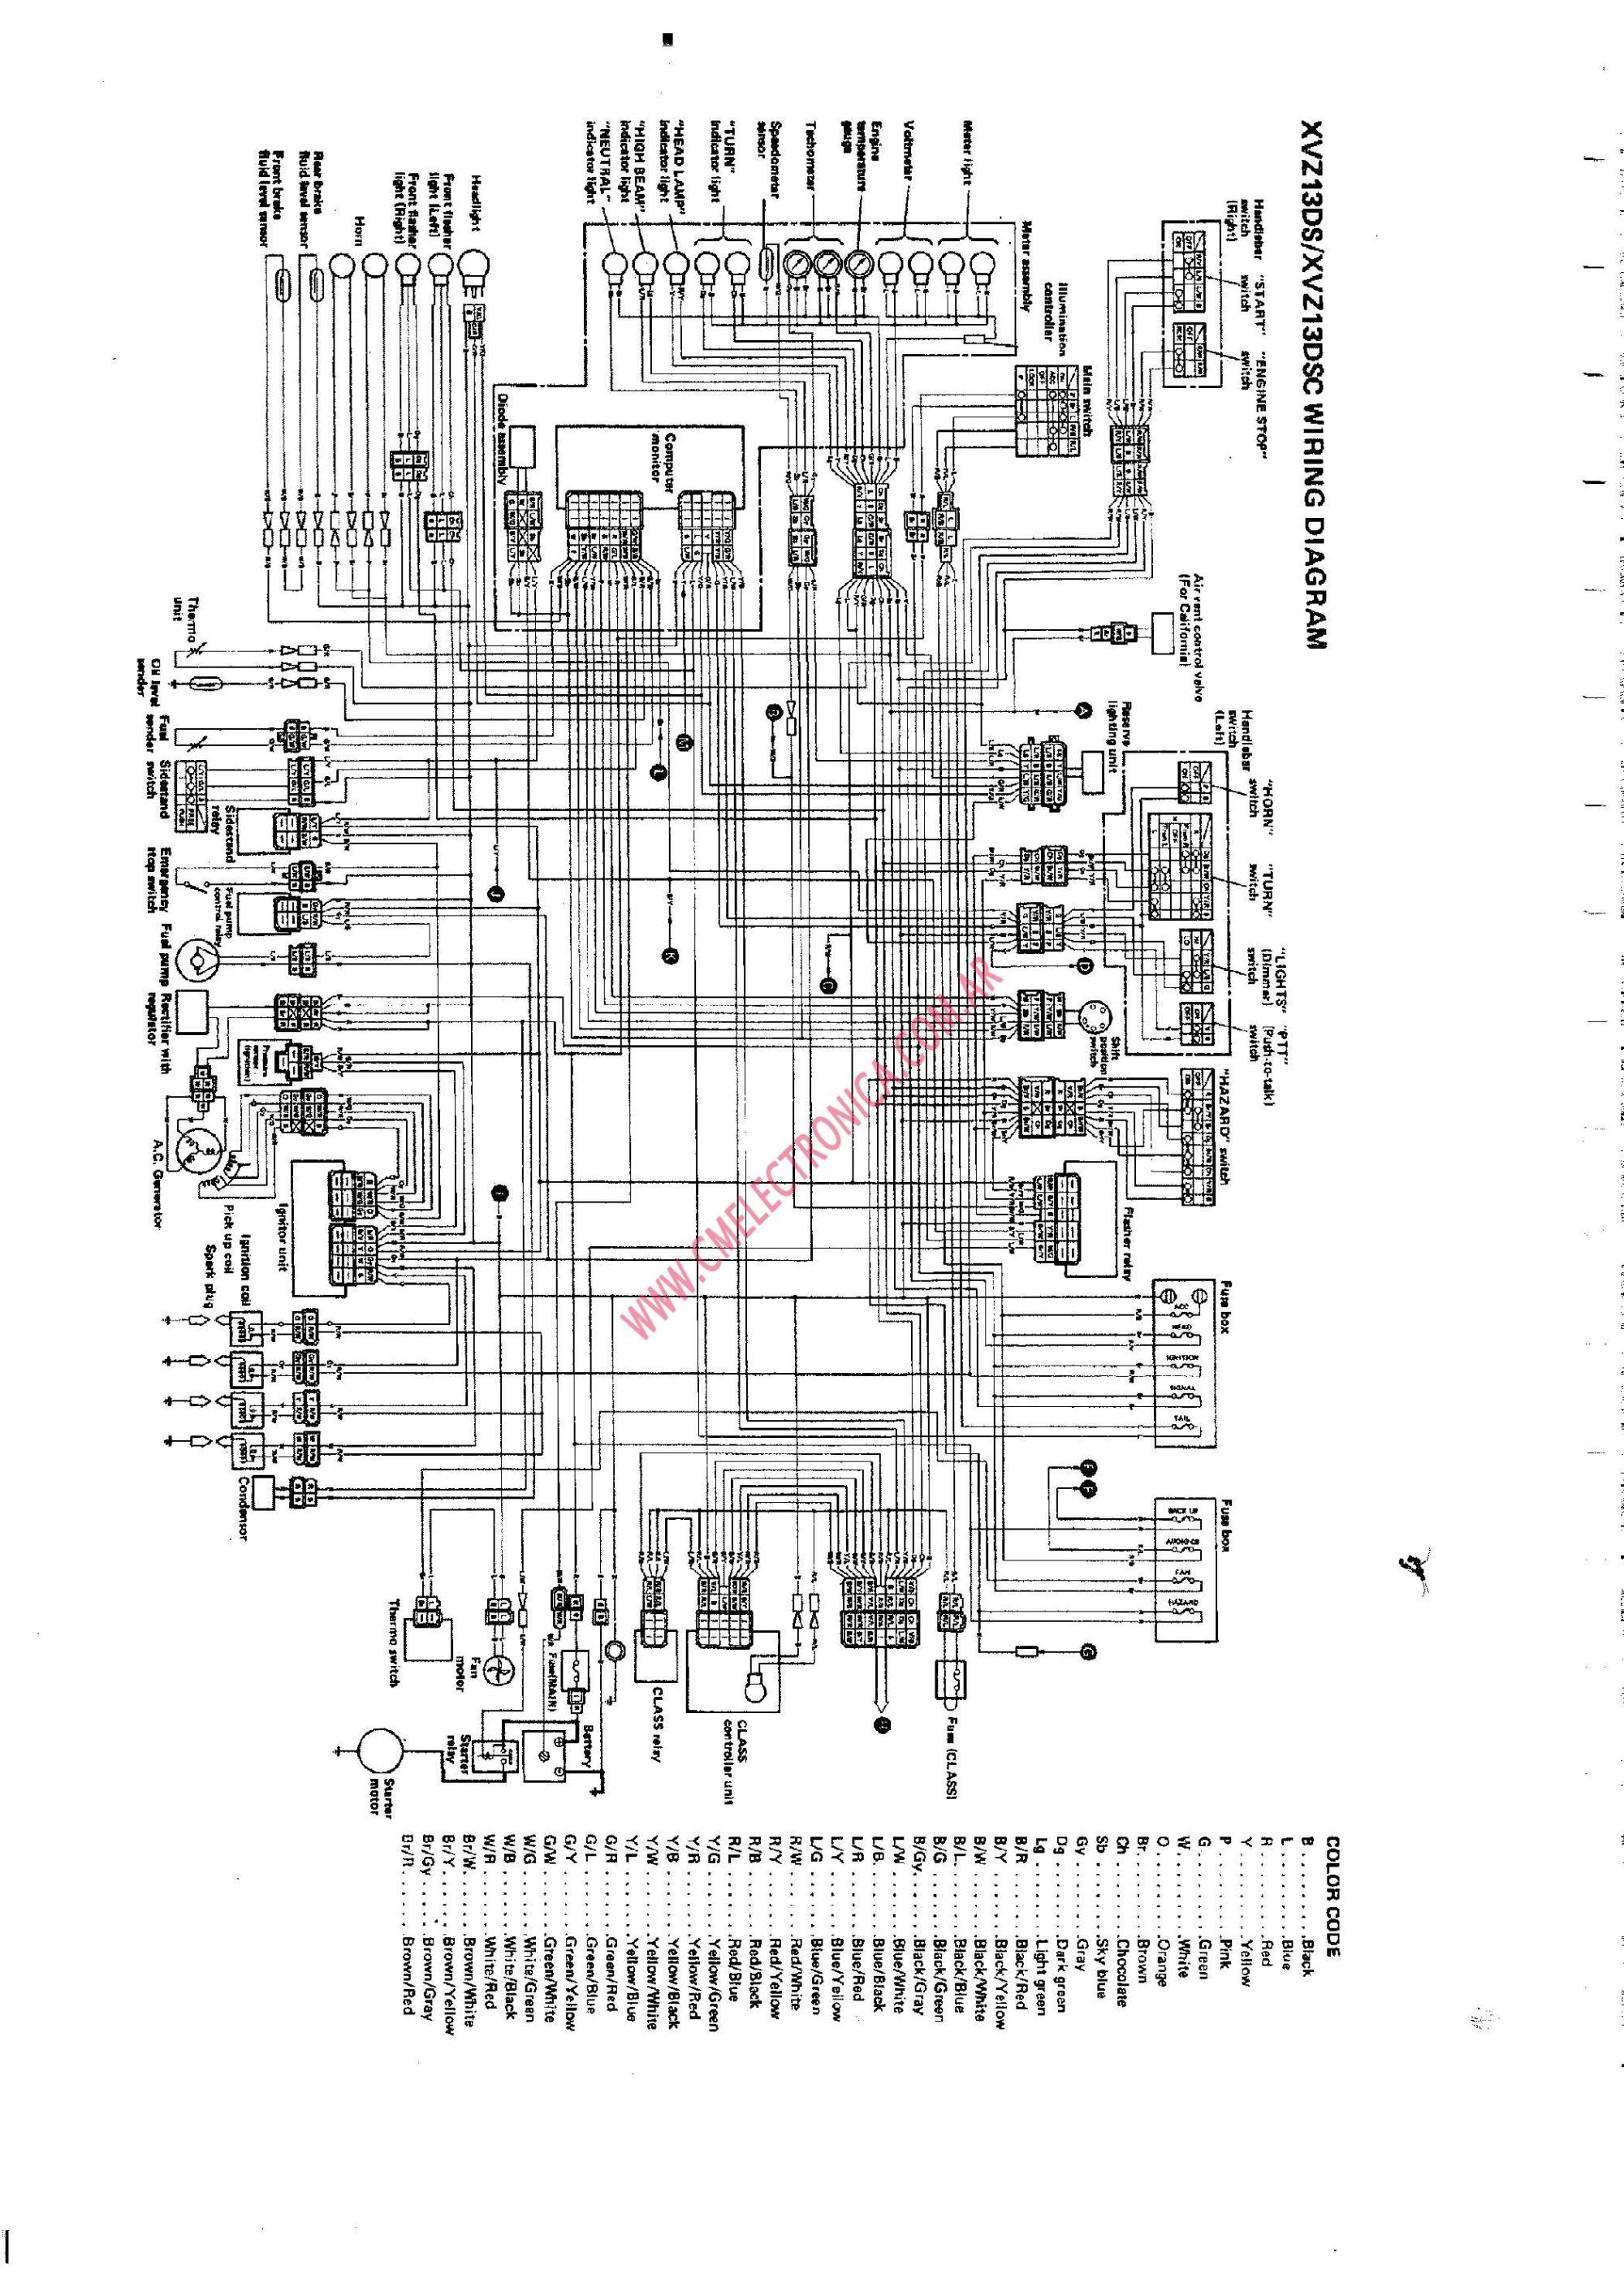 hight resolution of 83 honda nighthawk wiring diagram free download honda mr50 honda mr 50 wiring diagram honda mr50 pennsylvania